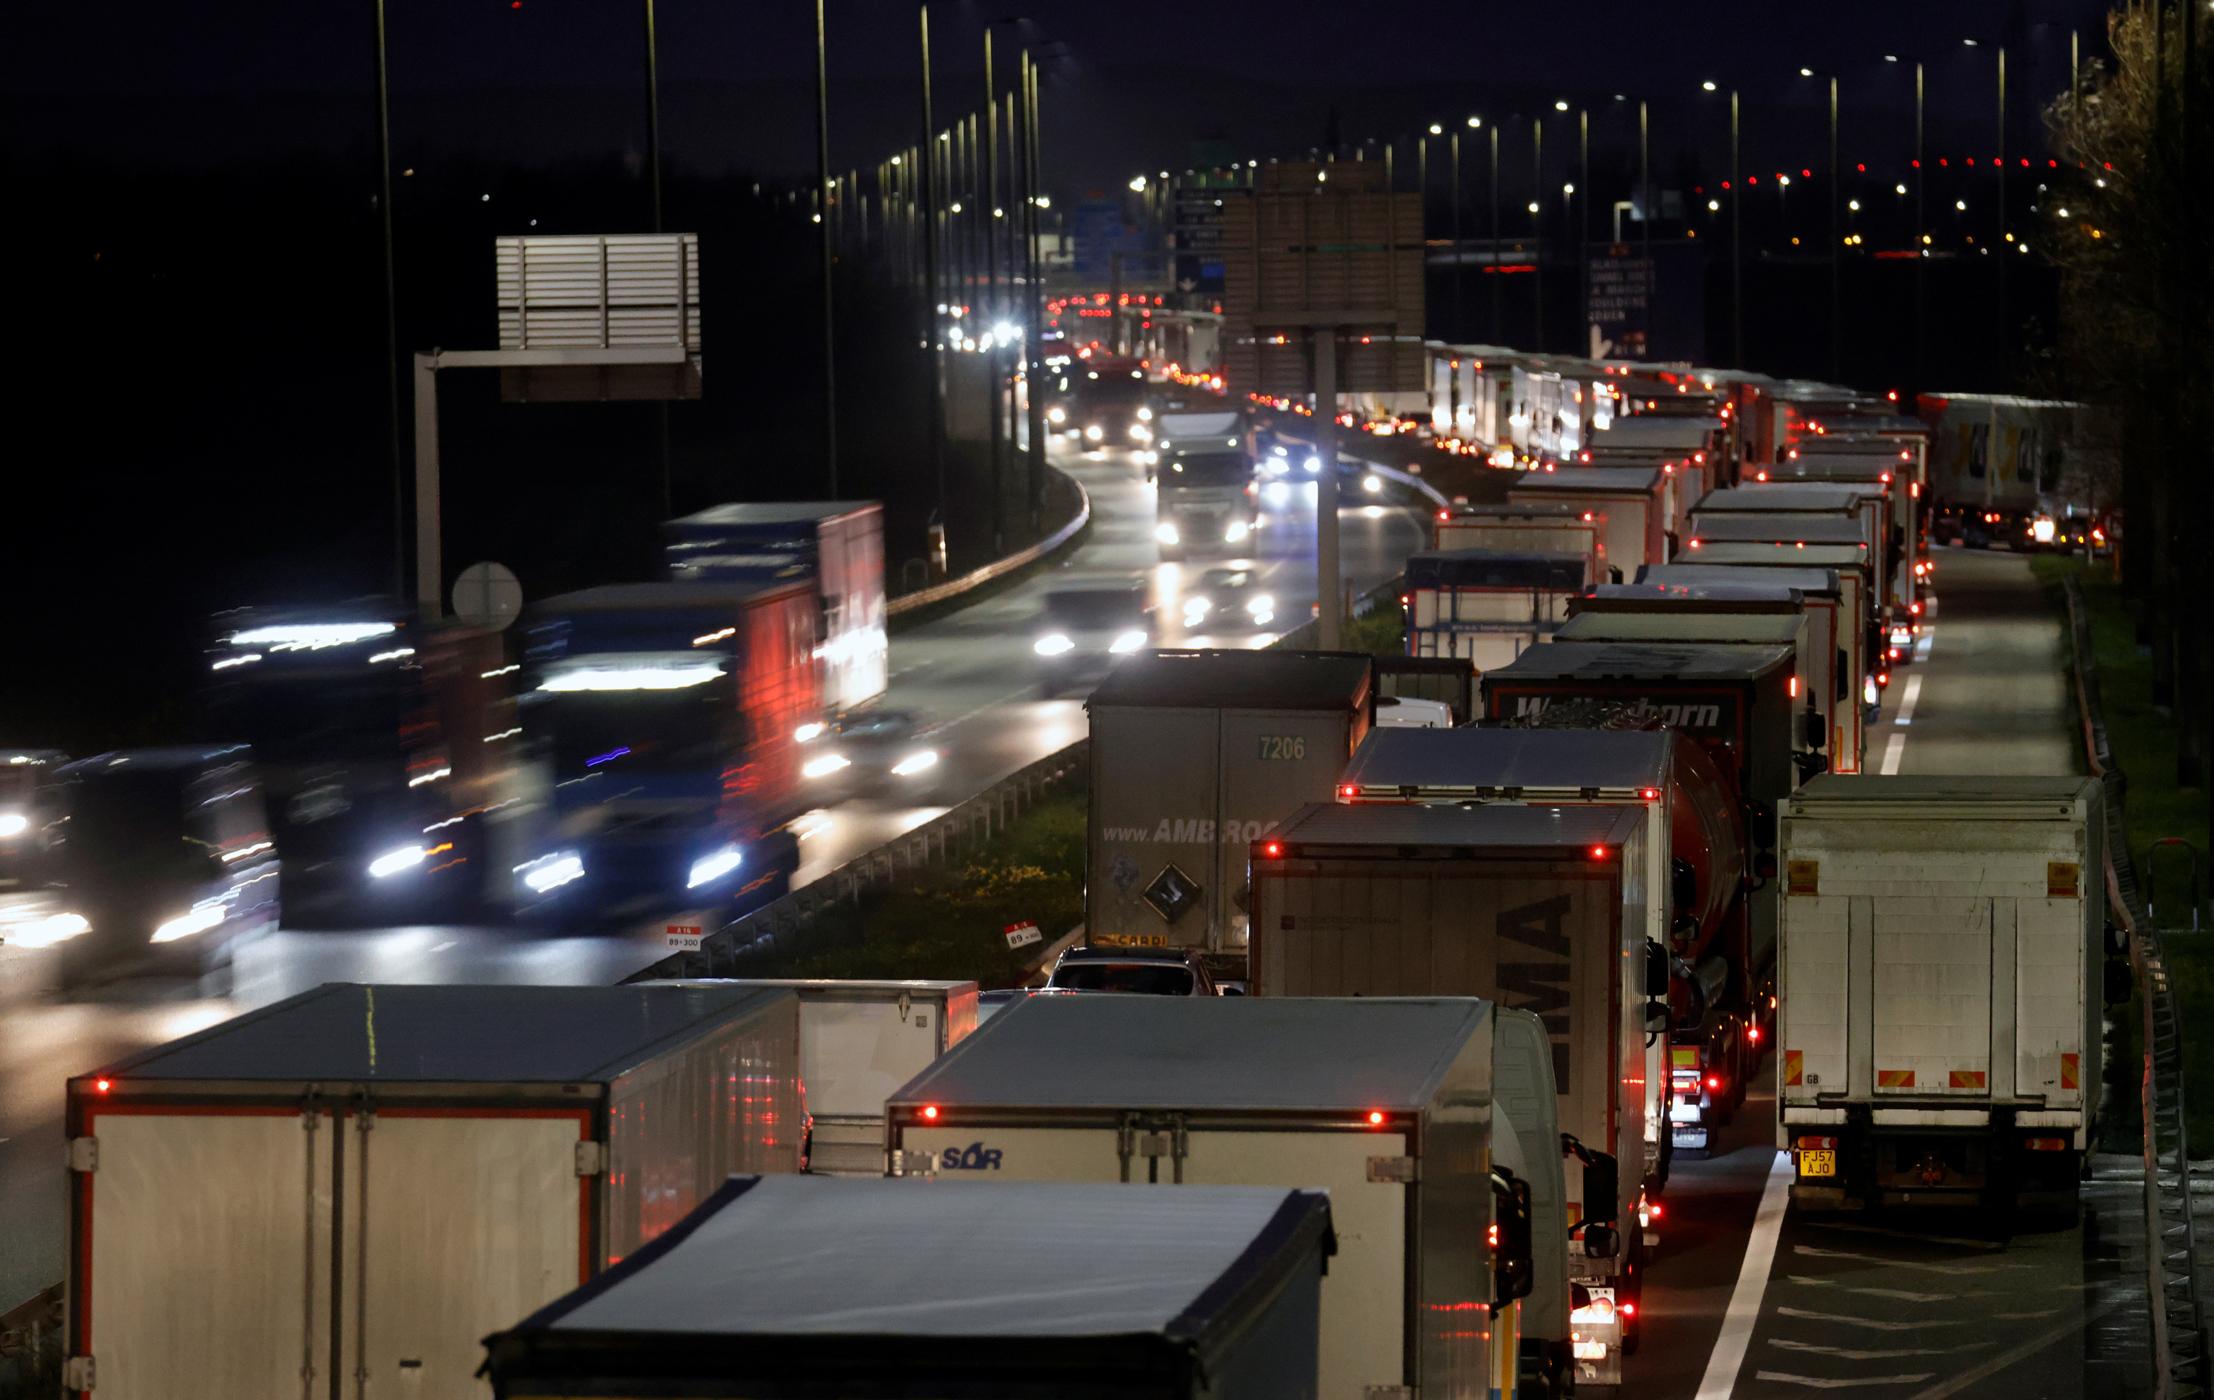 Brexit: Εμπορική συμφωνία ανάμεσα στη Βρετανία και την Τουρκία